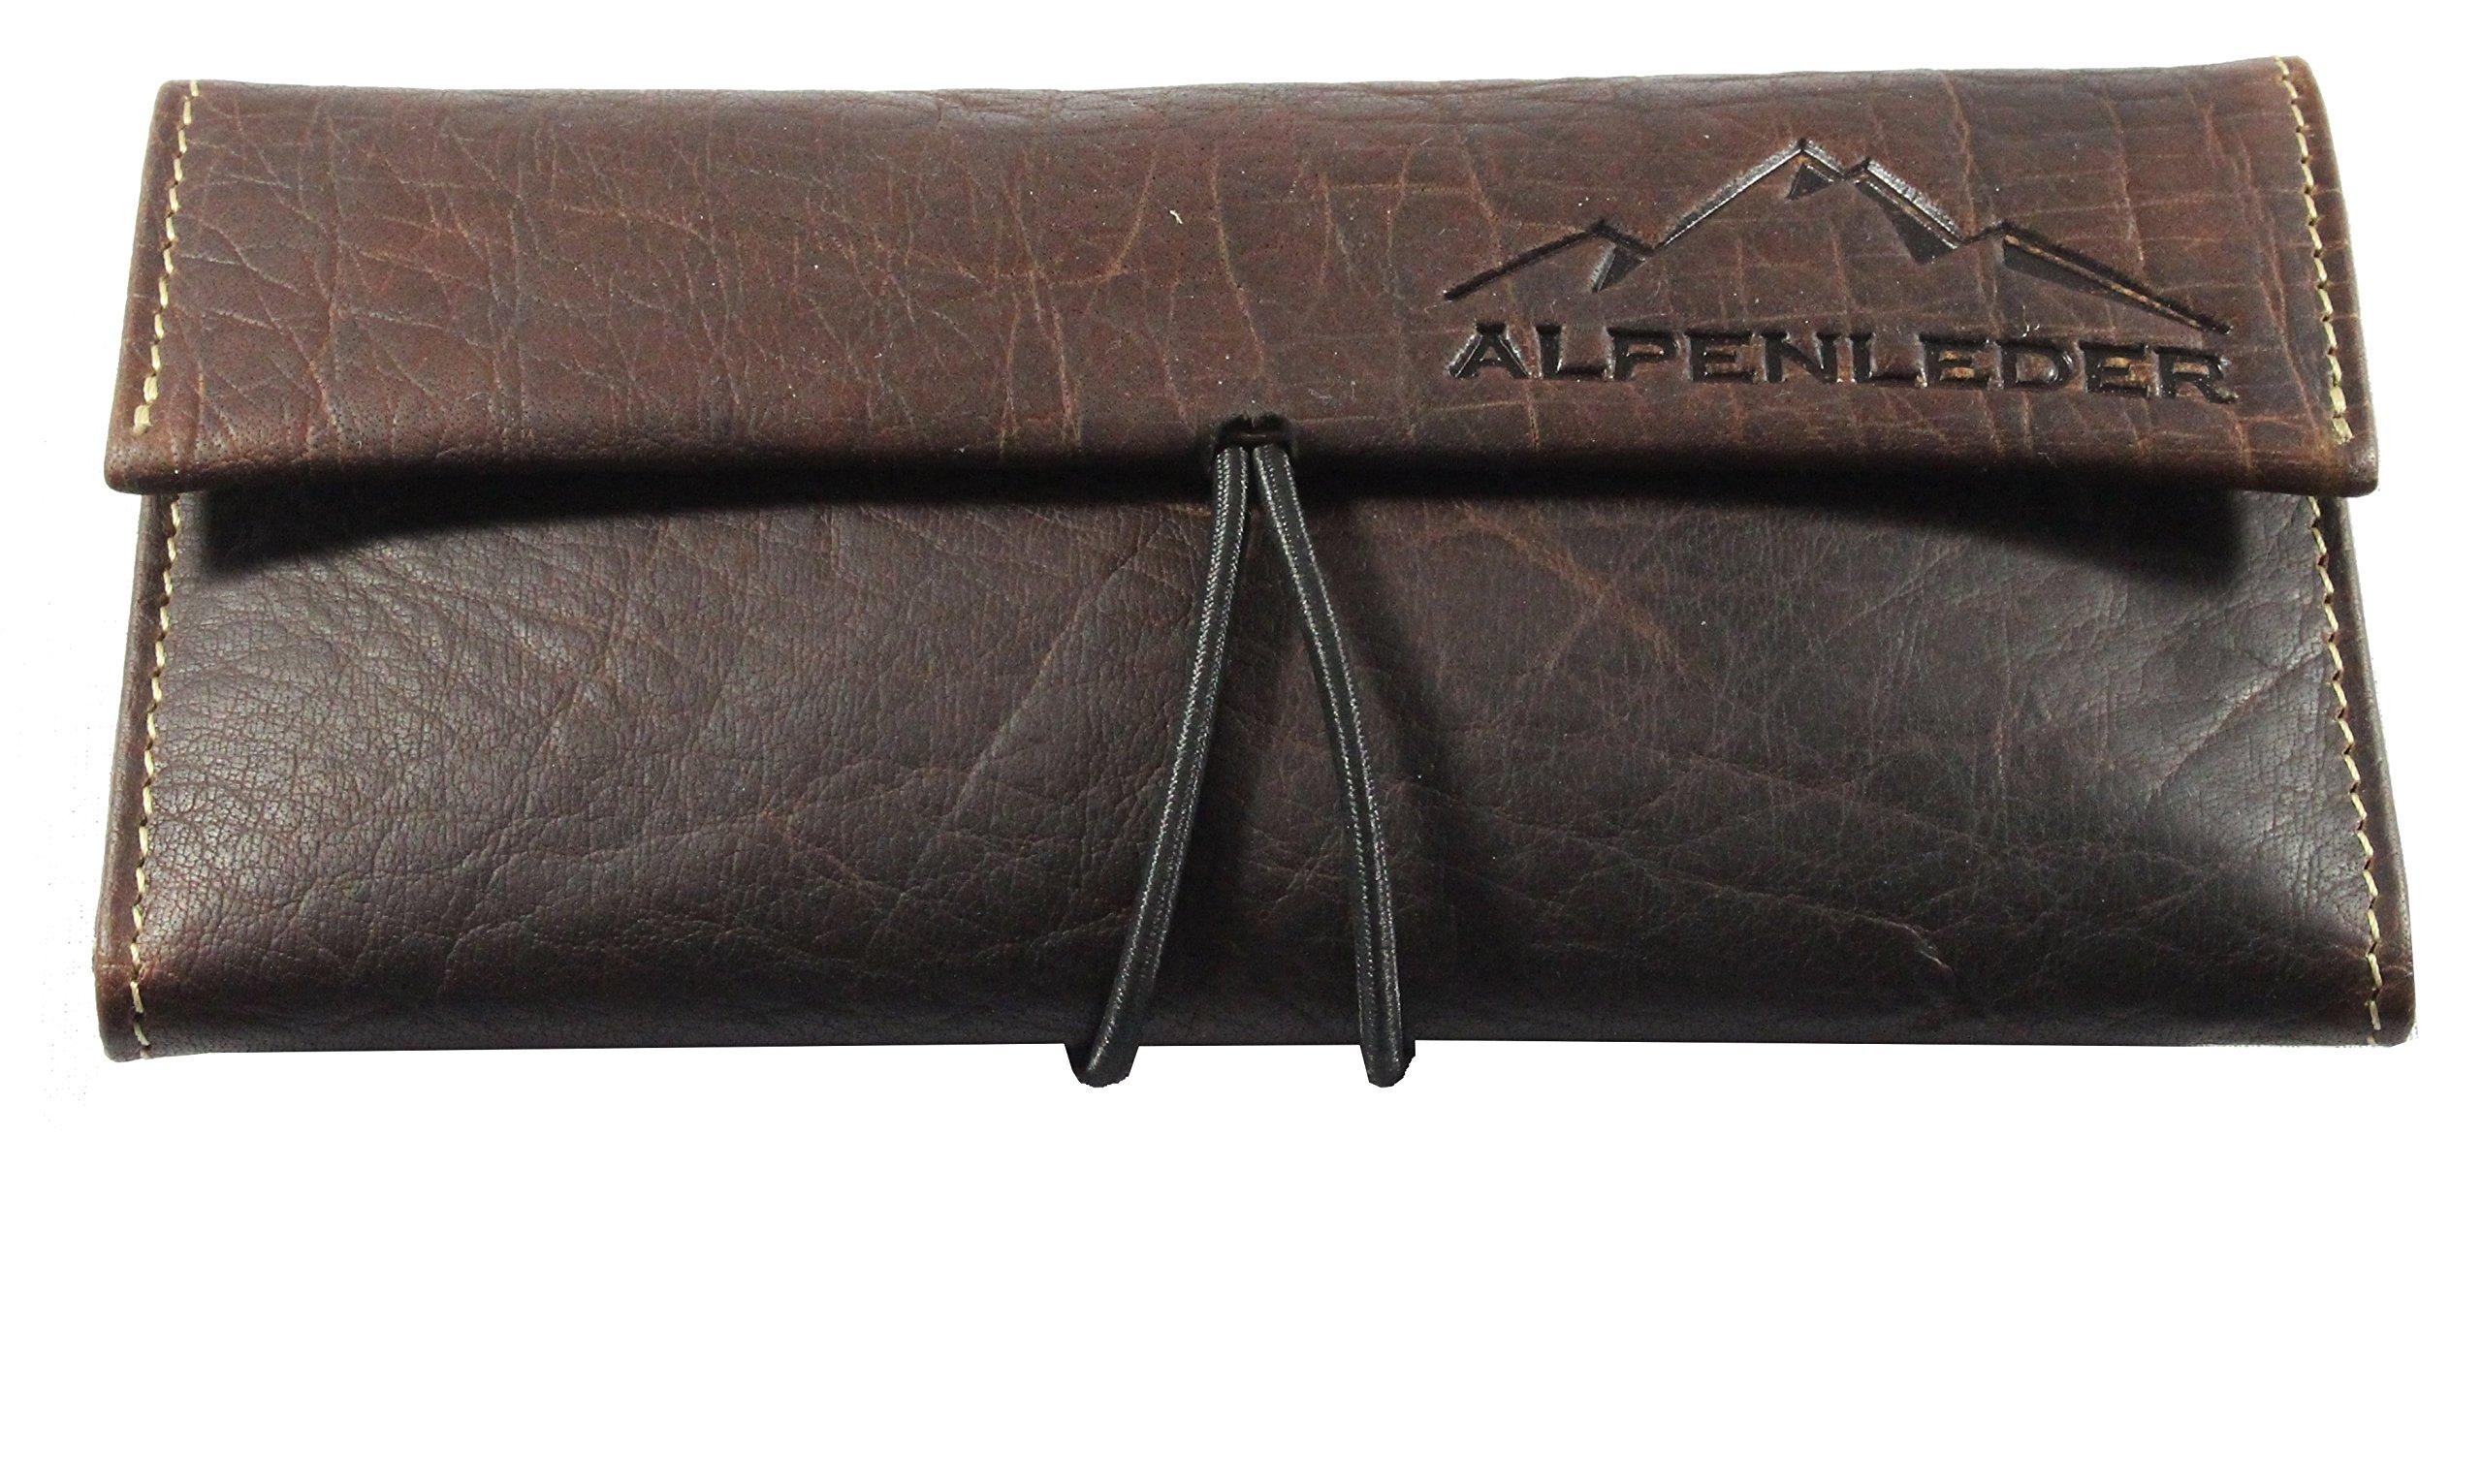 ALPENLEDER Tobacco Pouch HAVANNA - Genuine Buffalo Leather Pipe Bag, Brown